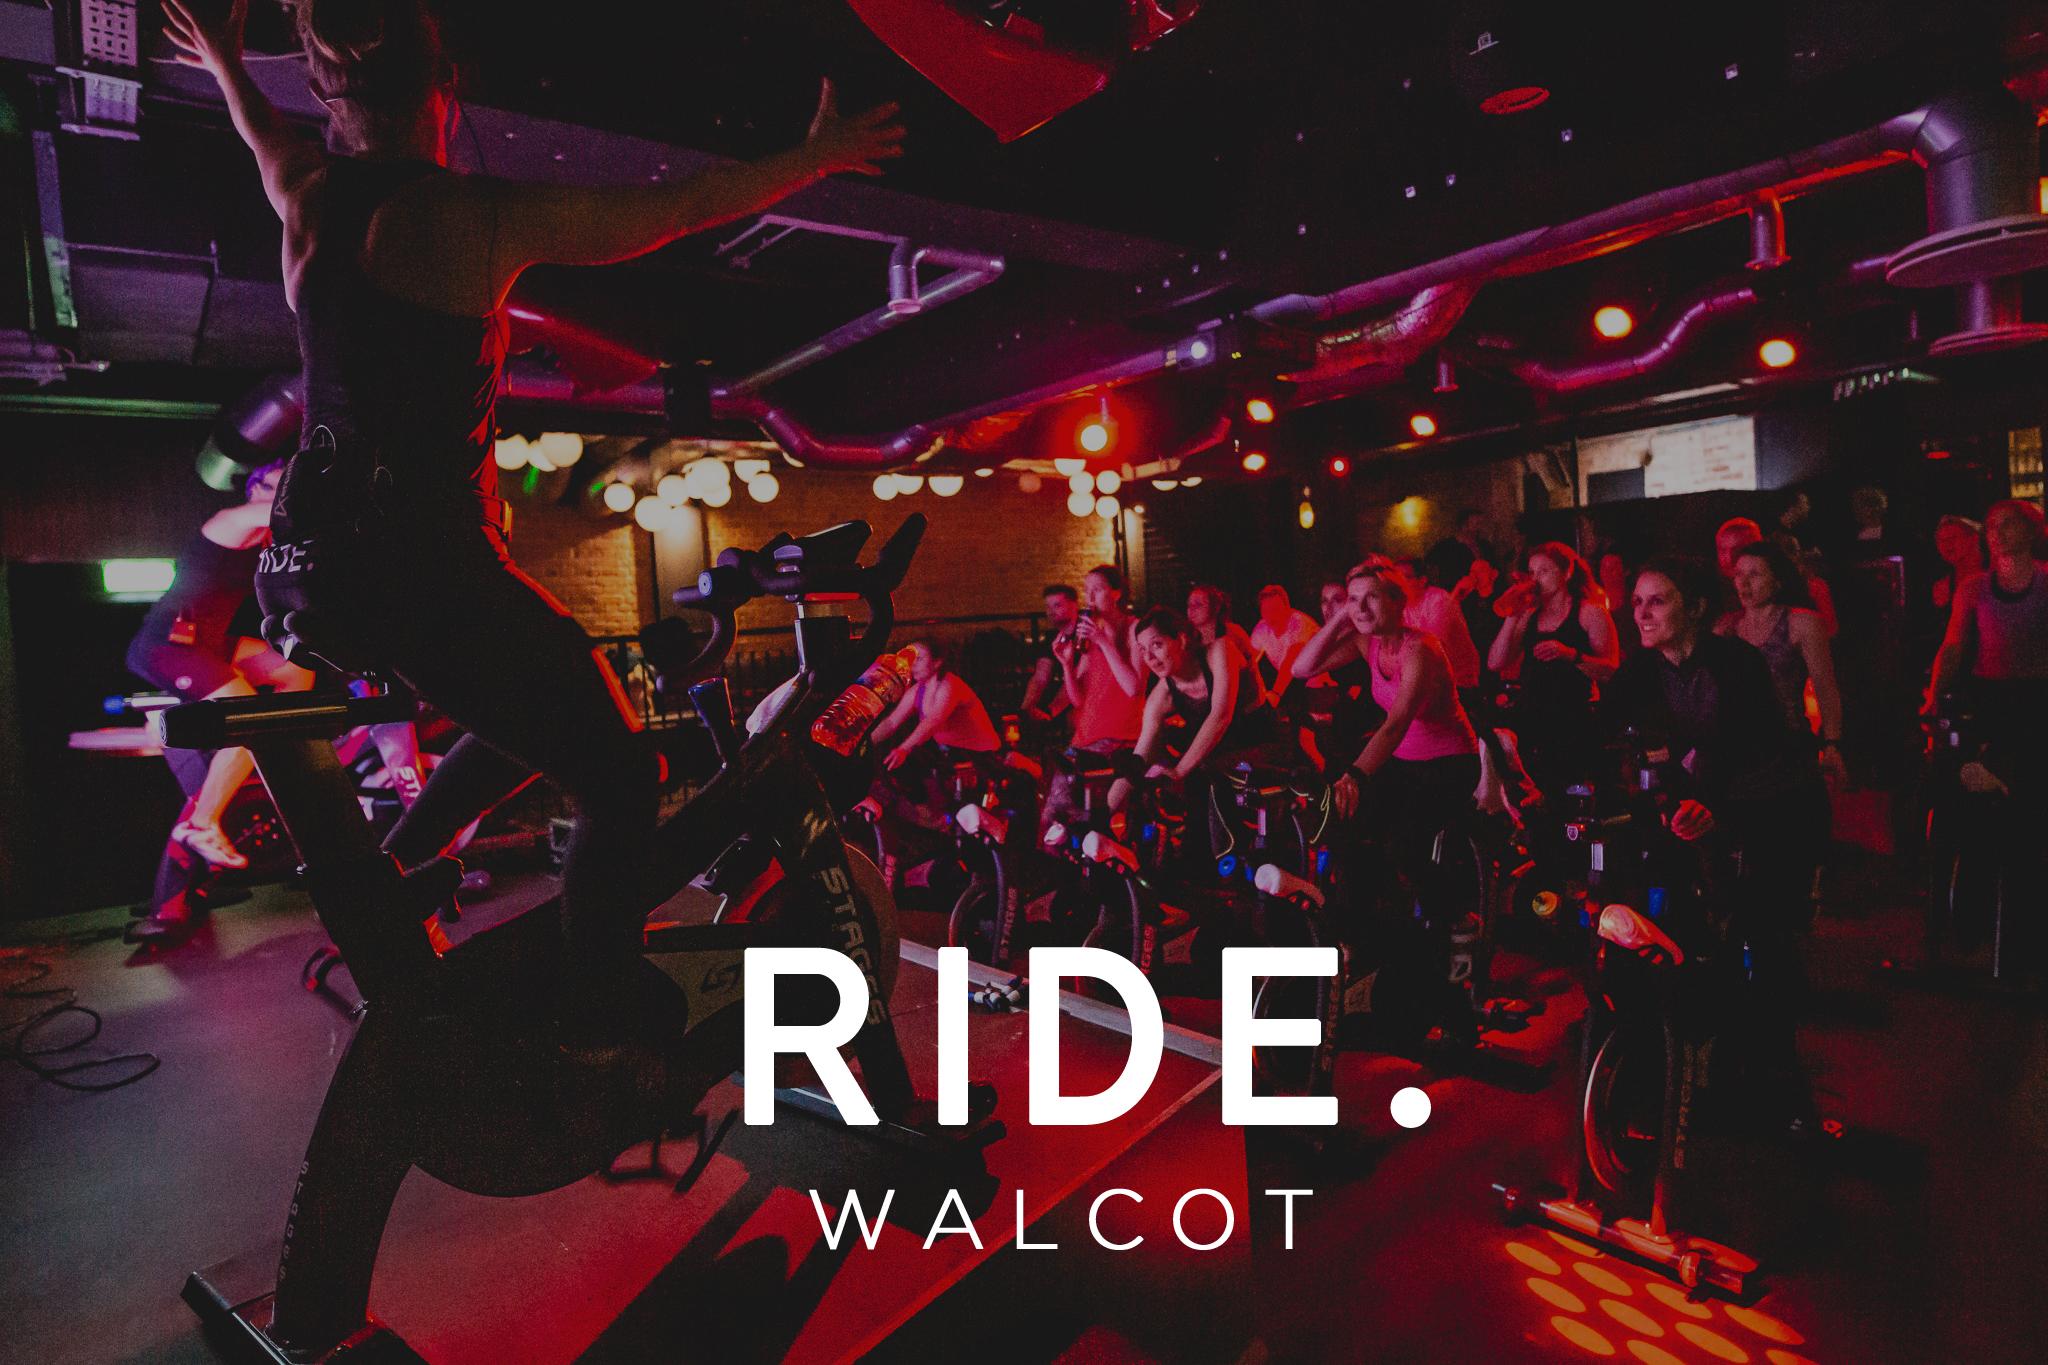 Ride walcot .jpg